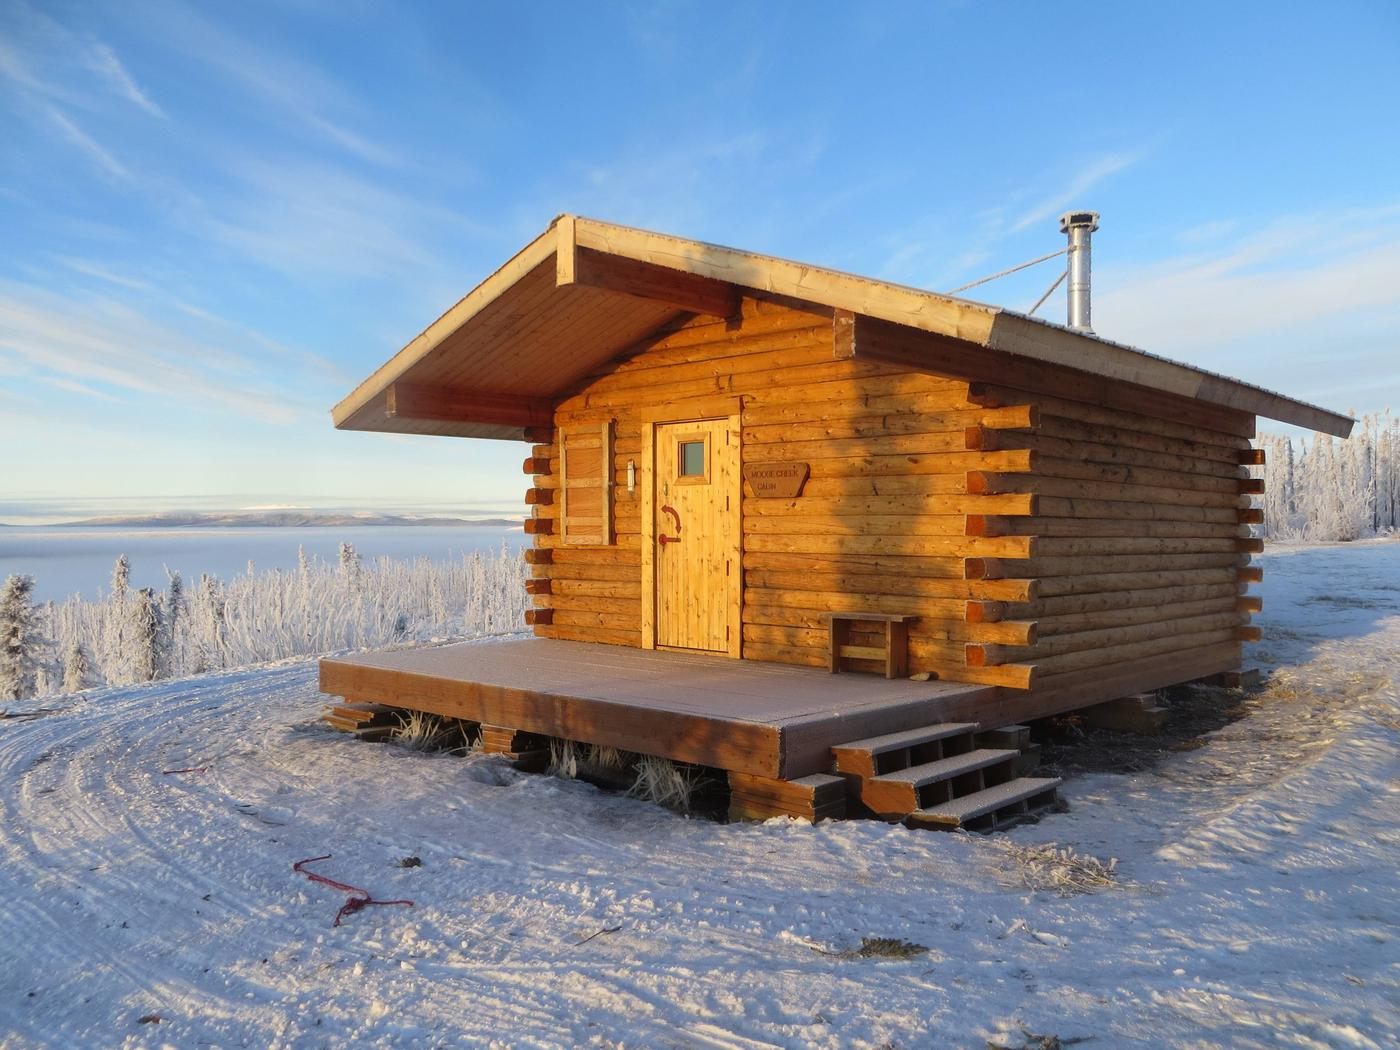 A log cabin on a snowy ridge under clear skiesMoose Creek Cabin in winter